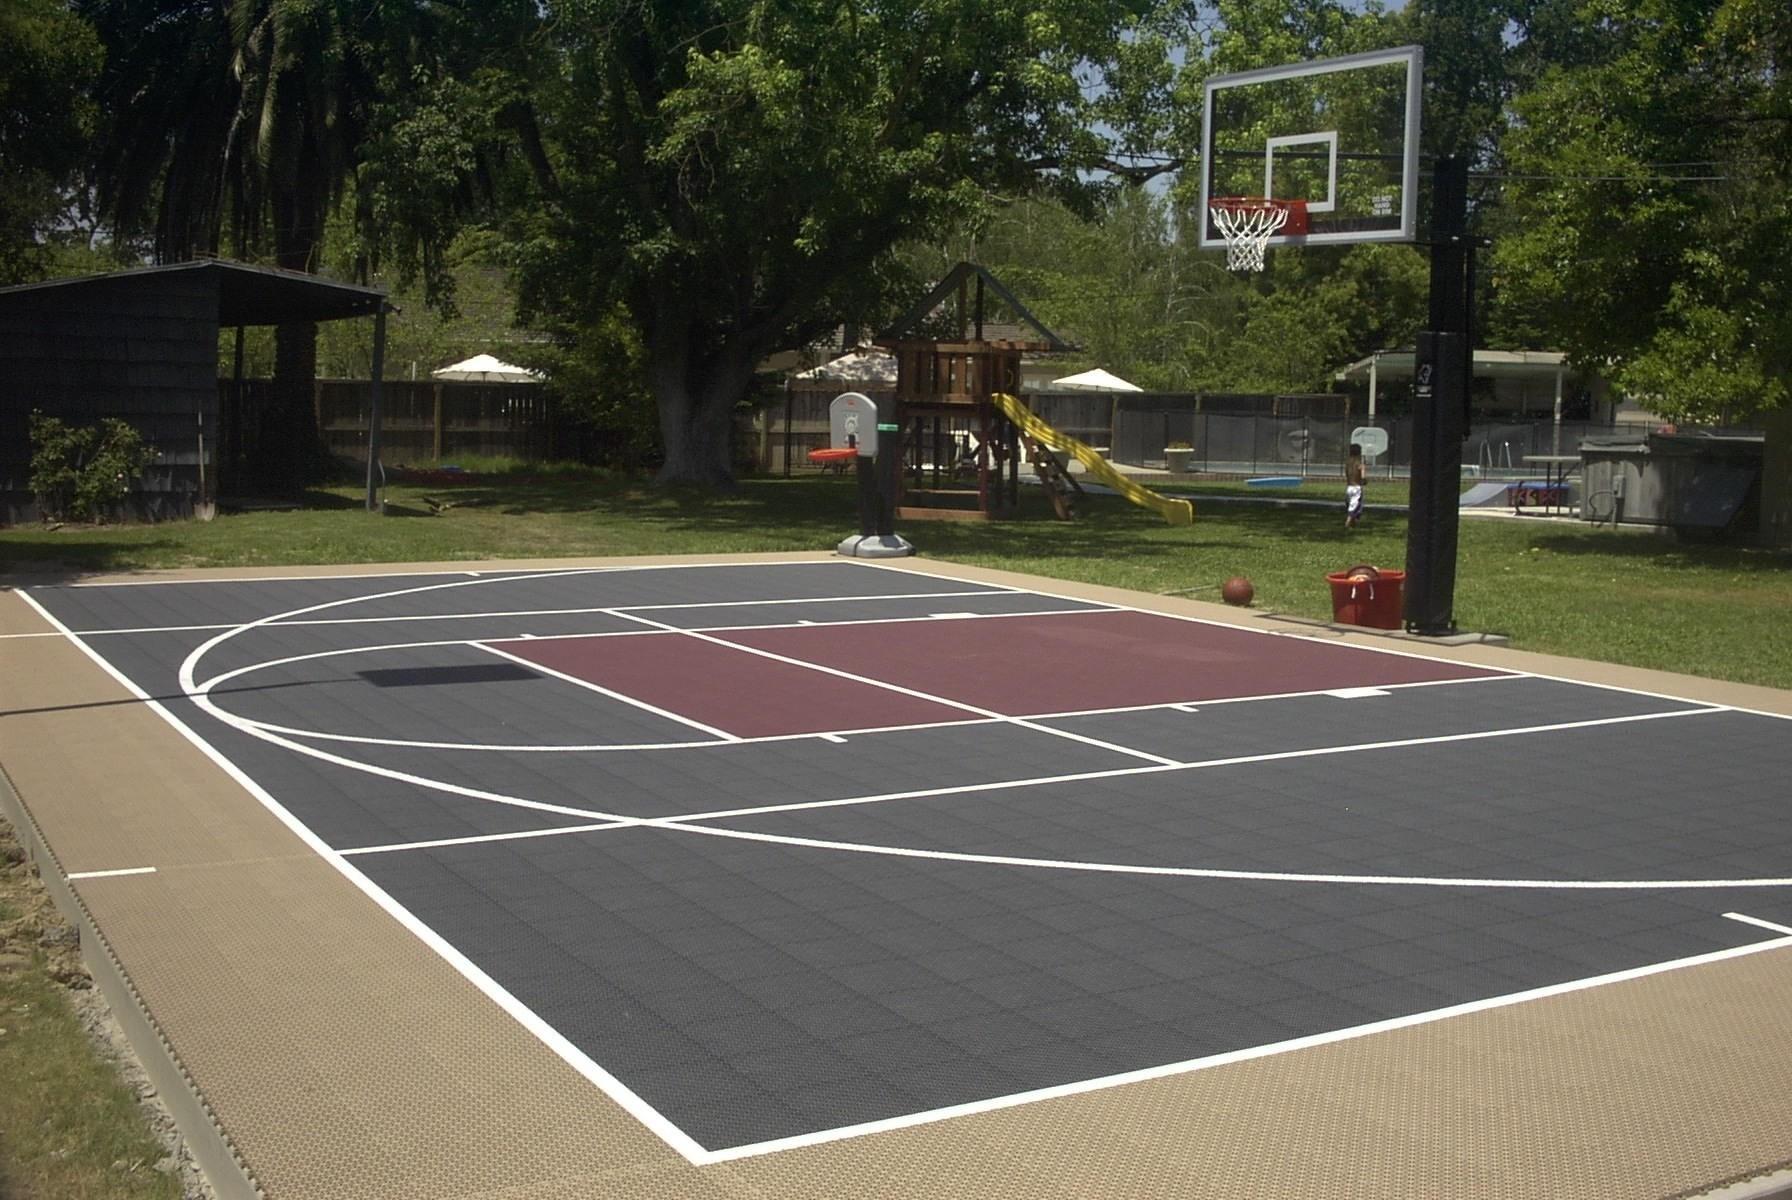 19.SIMPHOME.COM backyard basketball court 1000 43 ideas about backyard basketball